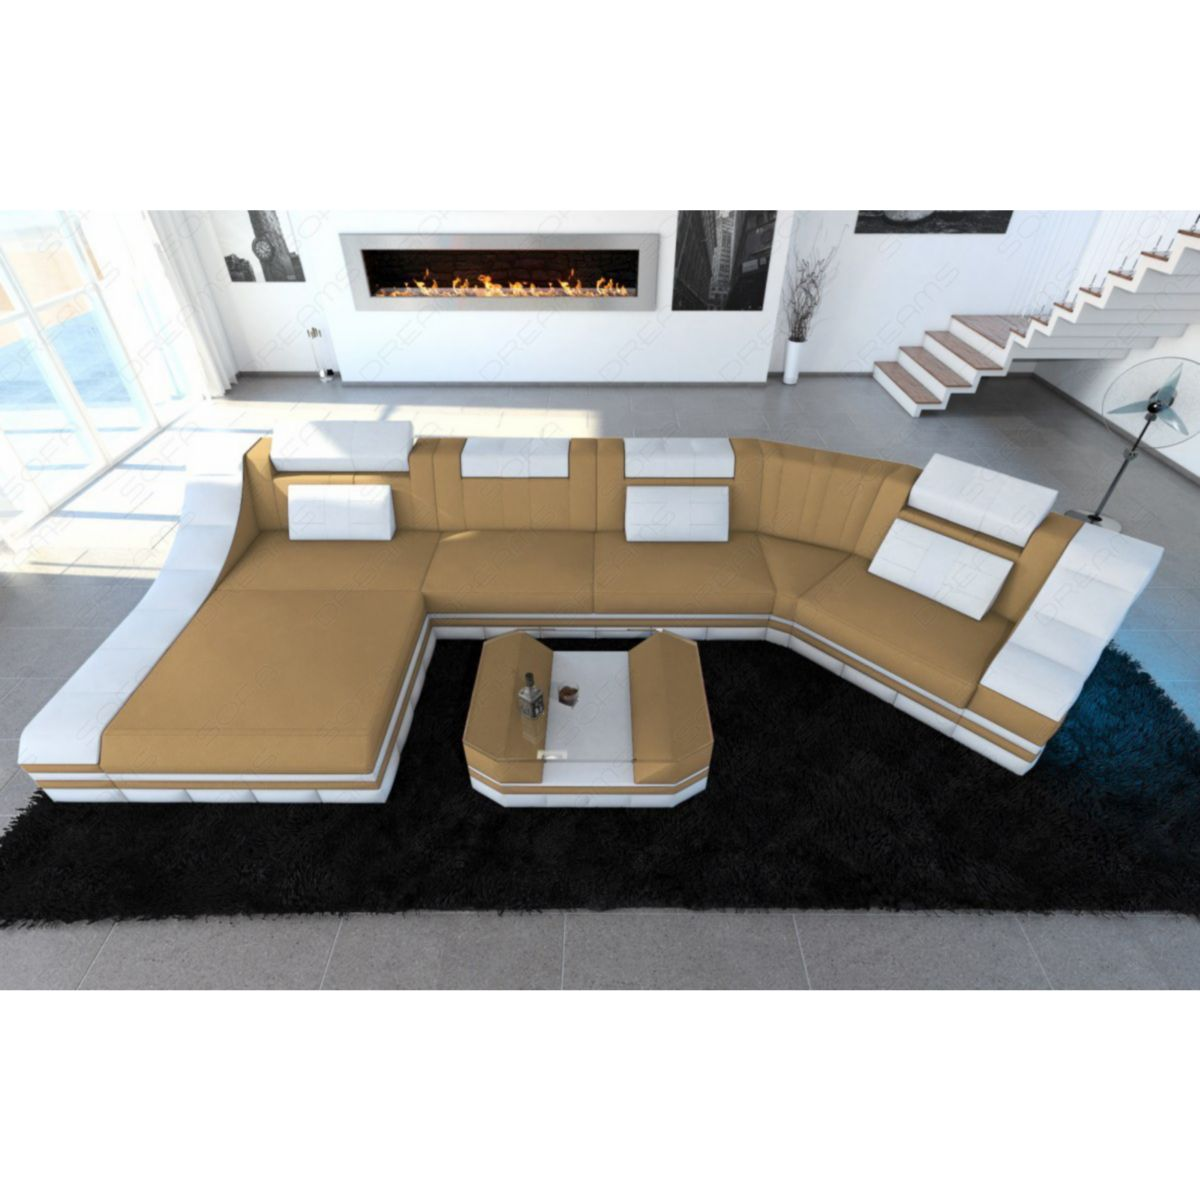 Sofa Dreams New Look Polster Wohnlandschaft TURINO C Form LED